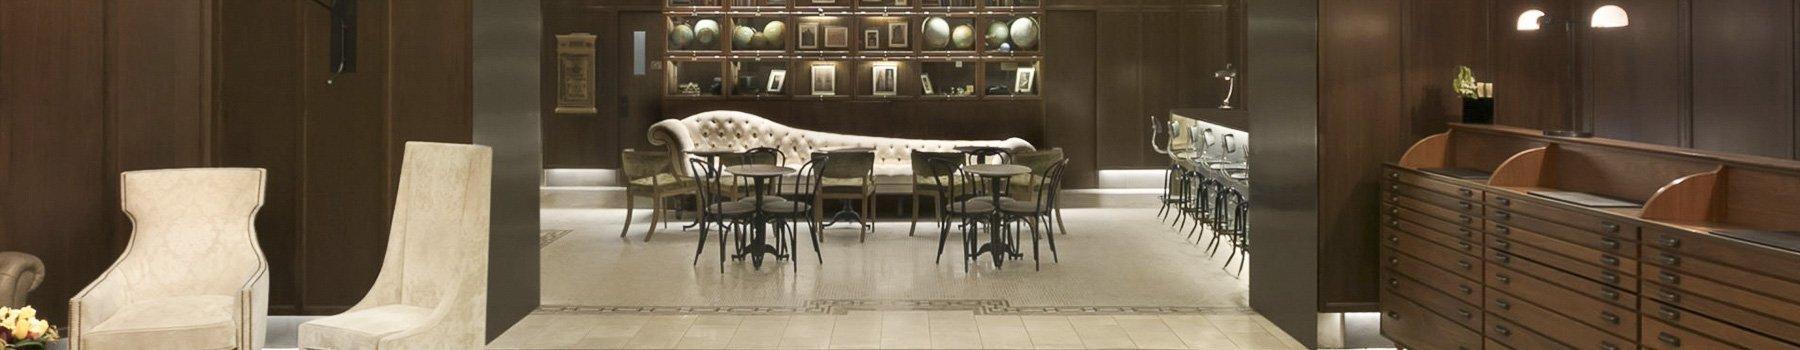 Hotel Belleclaire Lobby, New York